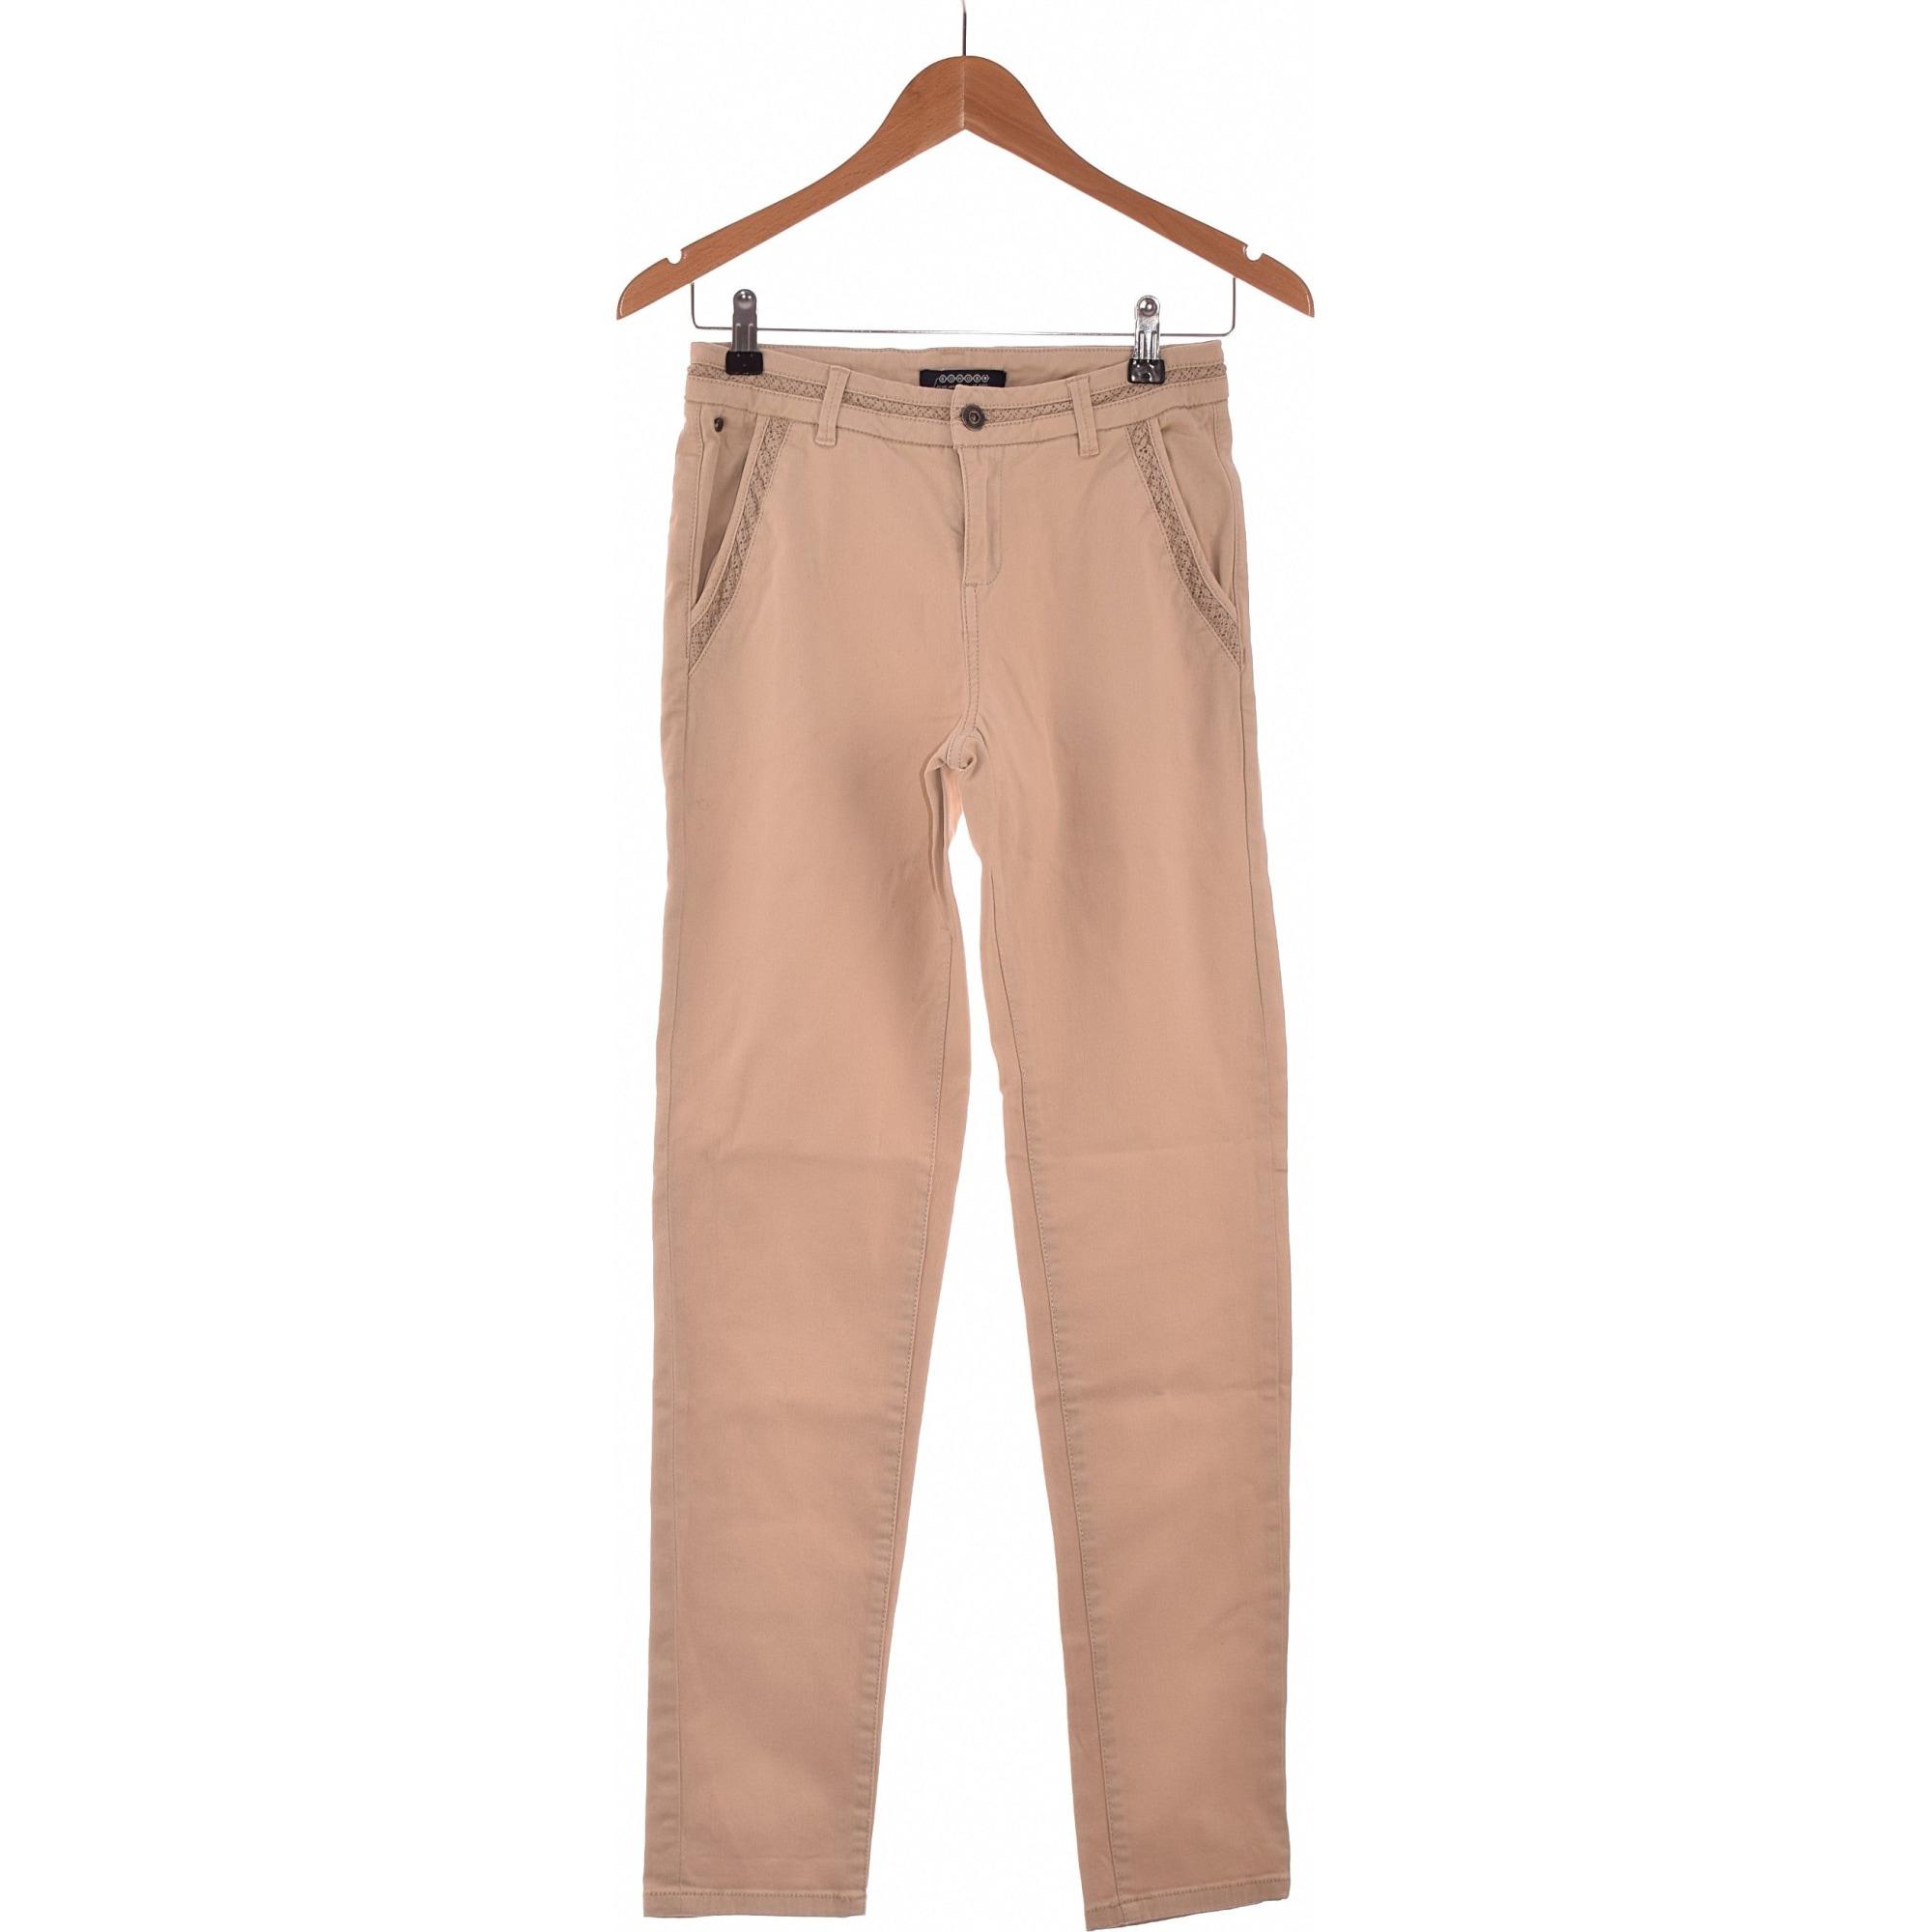 Jeans droit BONOBO Beige, camel